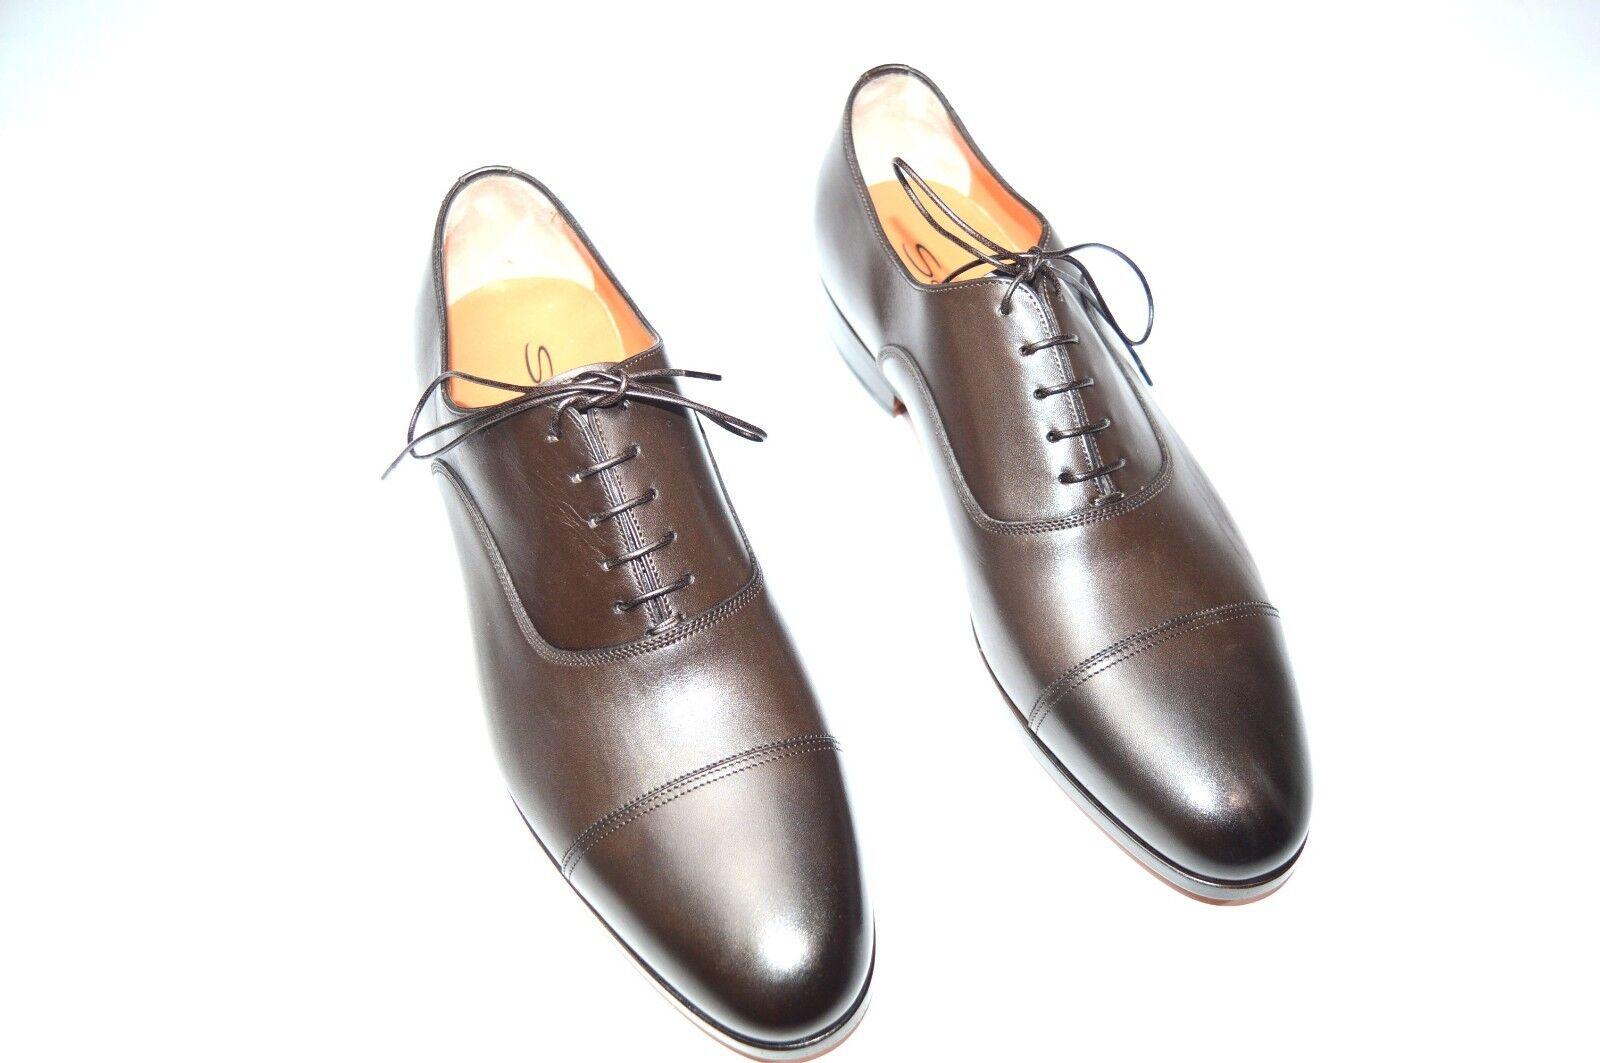 NEW SANTONI Dress Leather schuhe Größe Eu 43 Uk 9 Us 10 (27R)